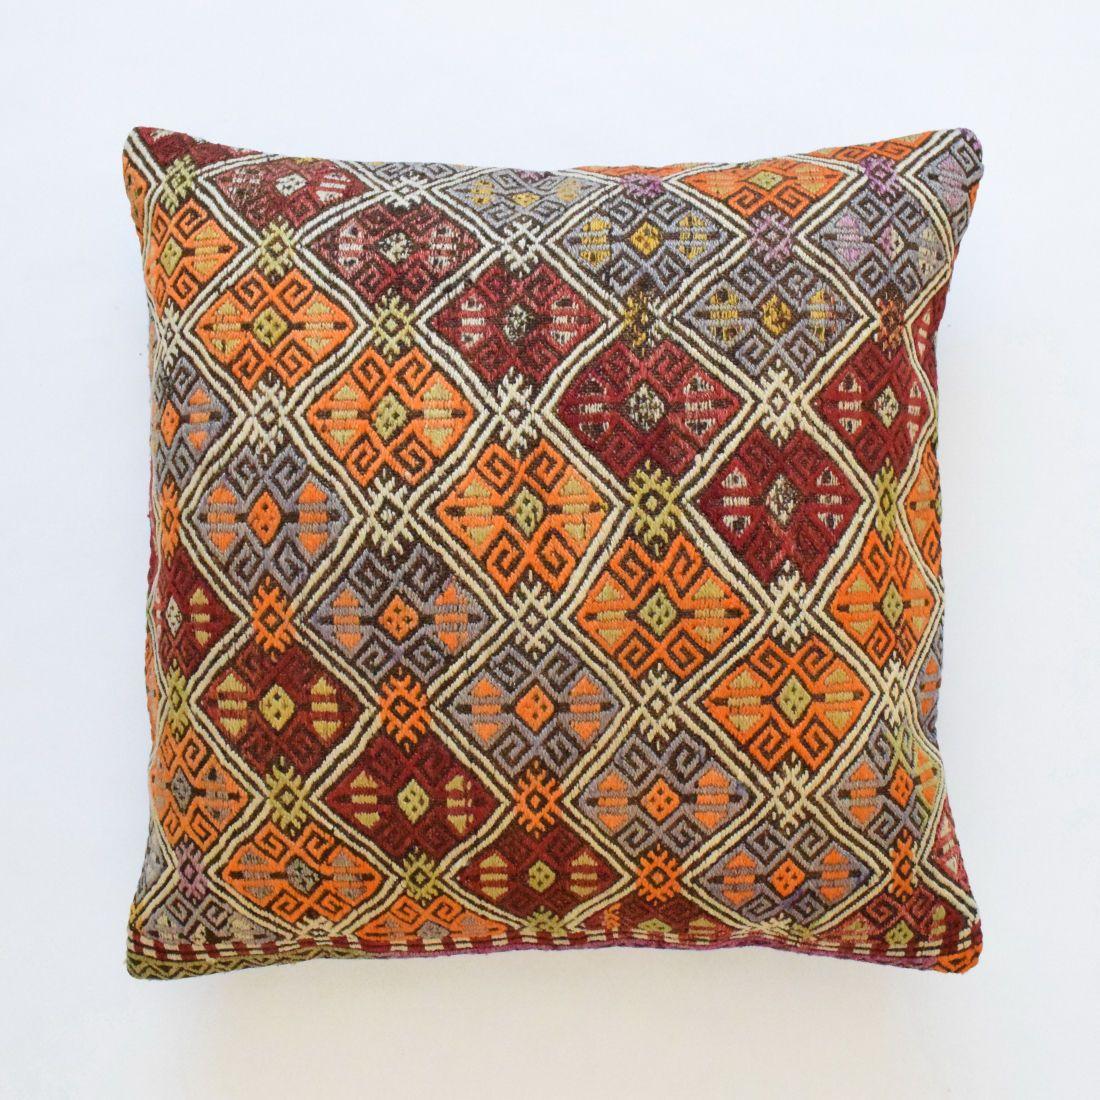 Pillow Covers Throw Pillow Covers Pillow Cushions Pillow Decor Home Pillow Decorative Pillow Throw Pillow Sets Pillows Pillow Covers Rustic Throw Pillows